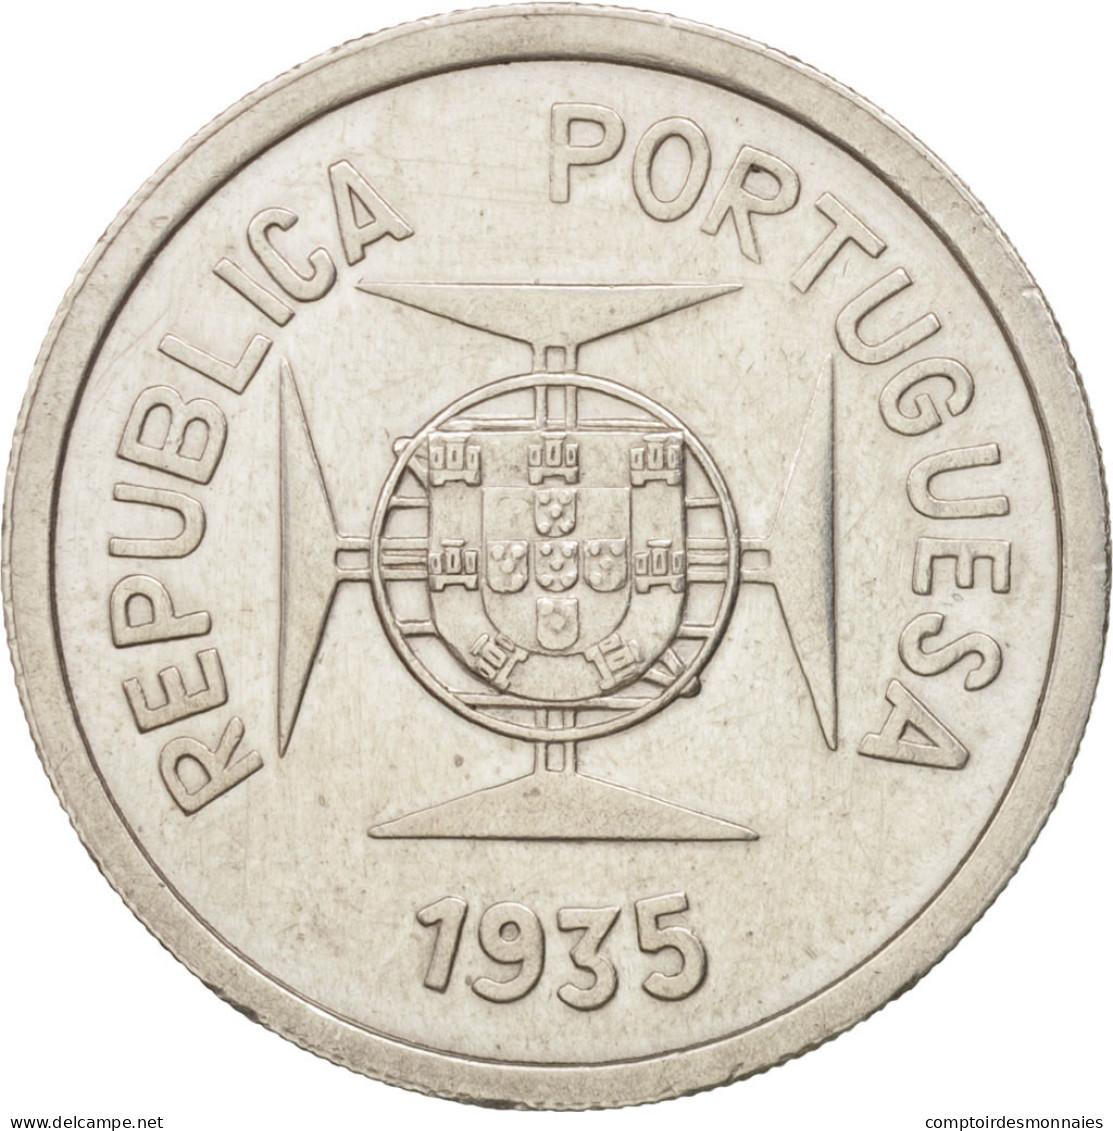 INDIA-PORTUGUESE, Rupia, 1935, SUP, Argent, KM:22 - India